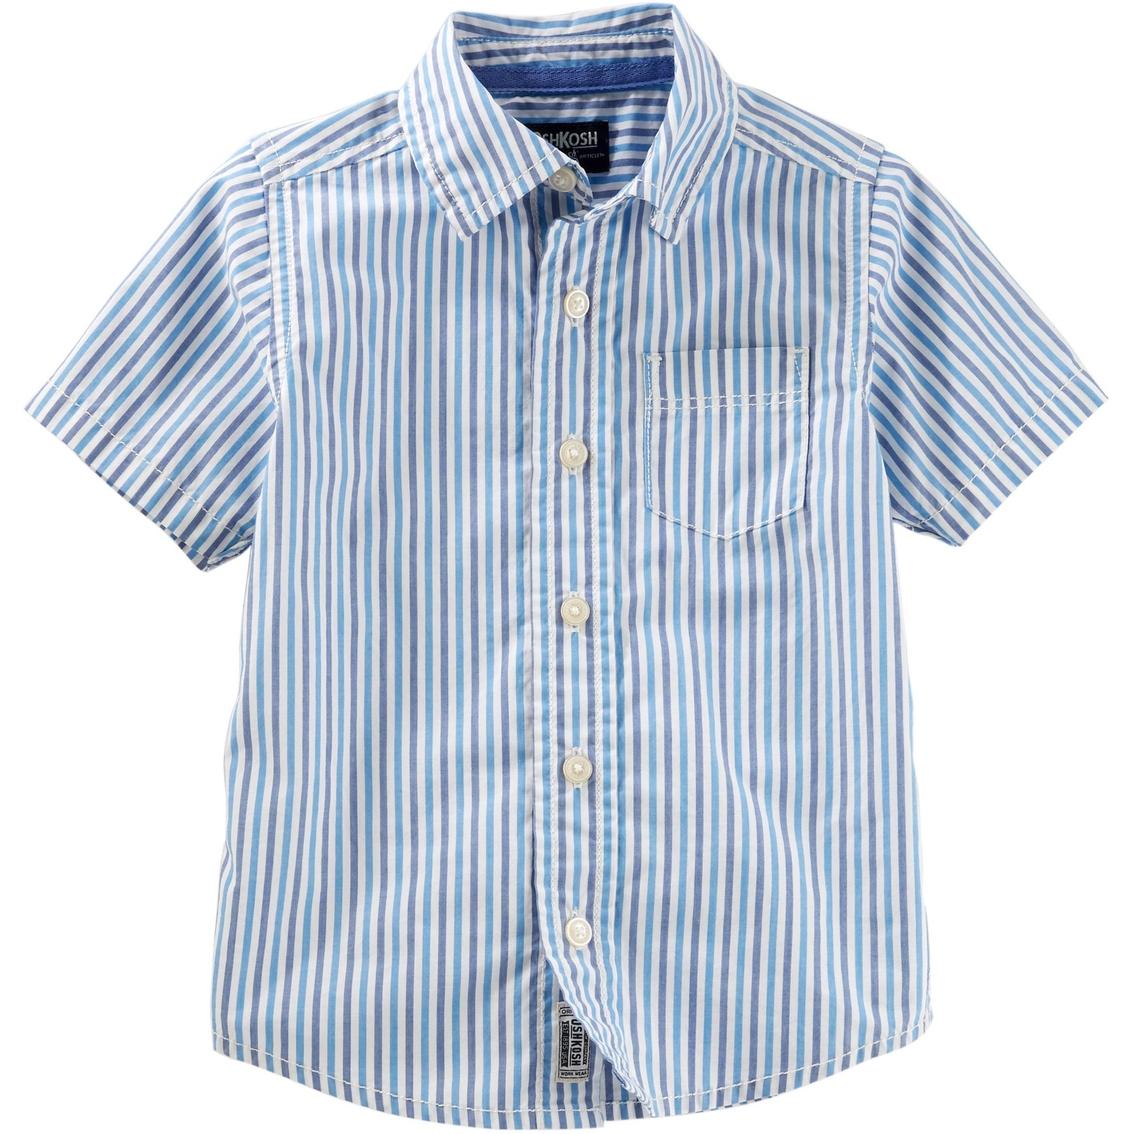 OshKosh BGosh Boys Striped Button Down Shirt